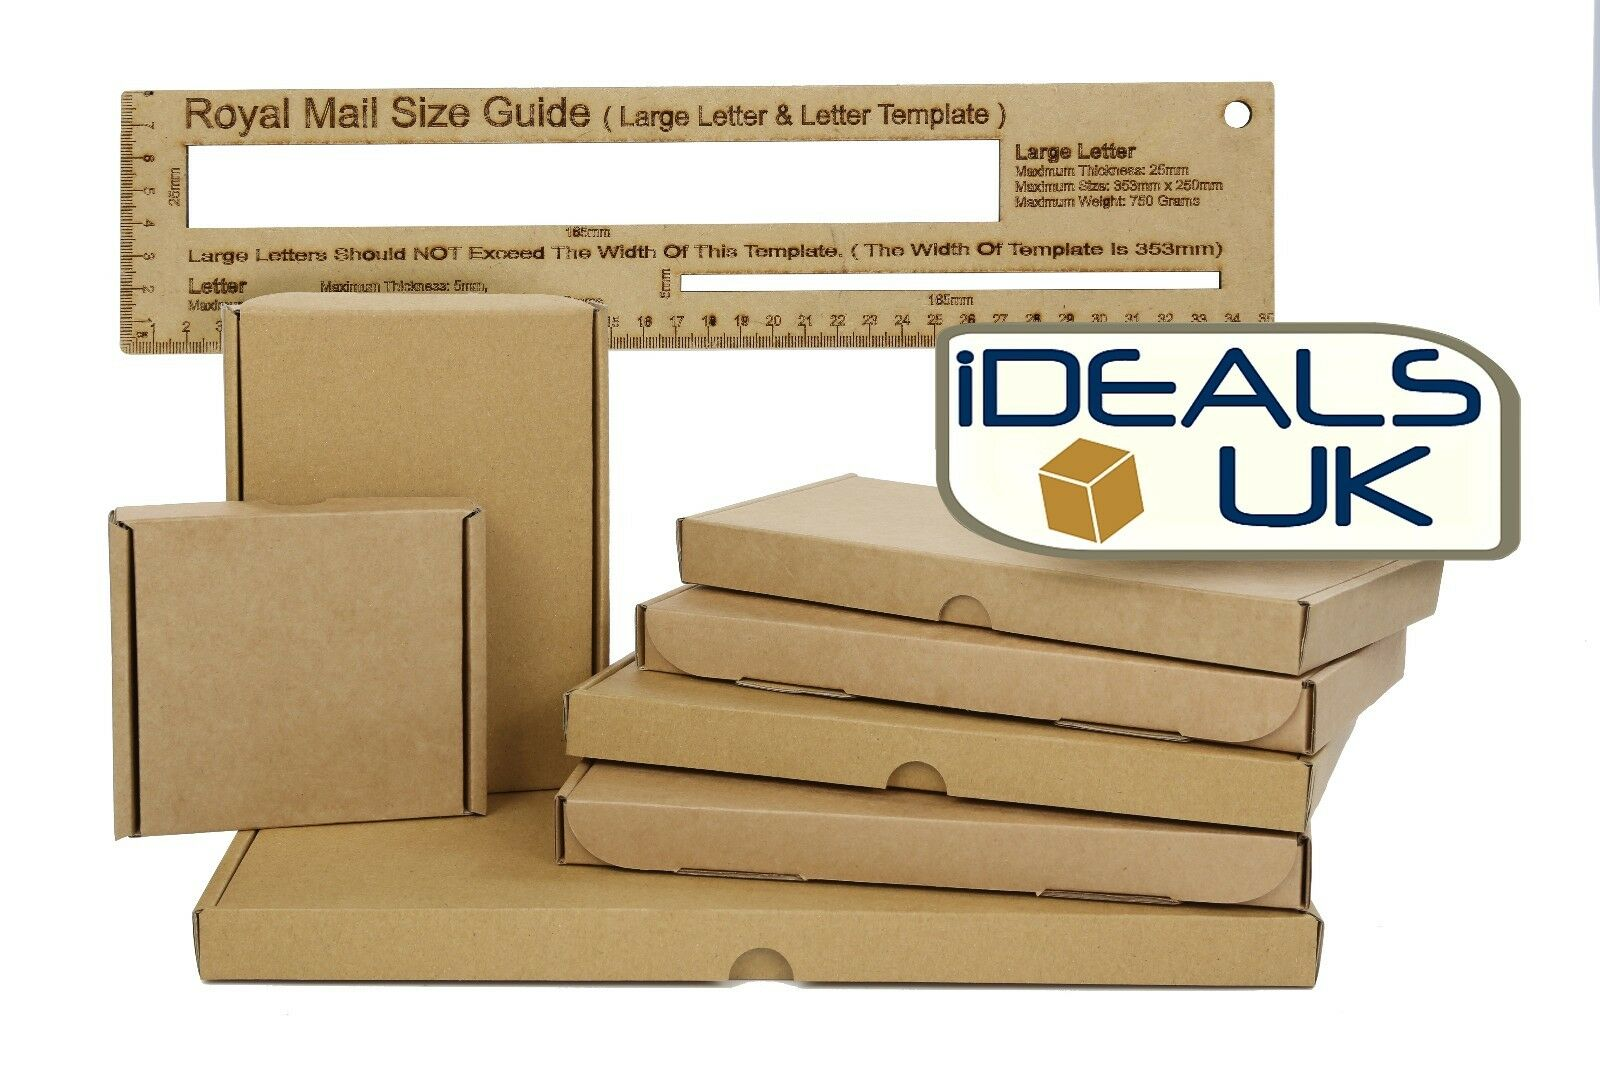 Royal Mail PiP Large Letter Size Cardboard Postal Mailing PiP Box- MULTI-LISTING